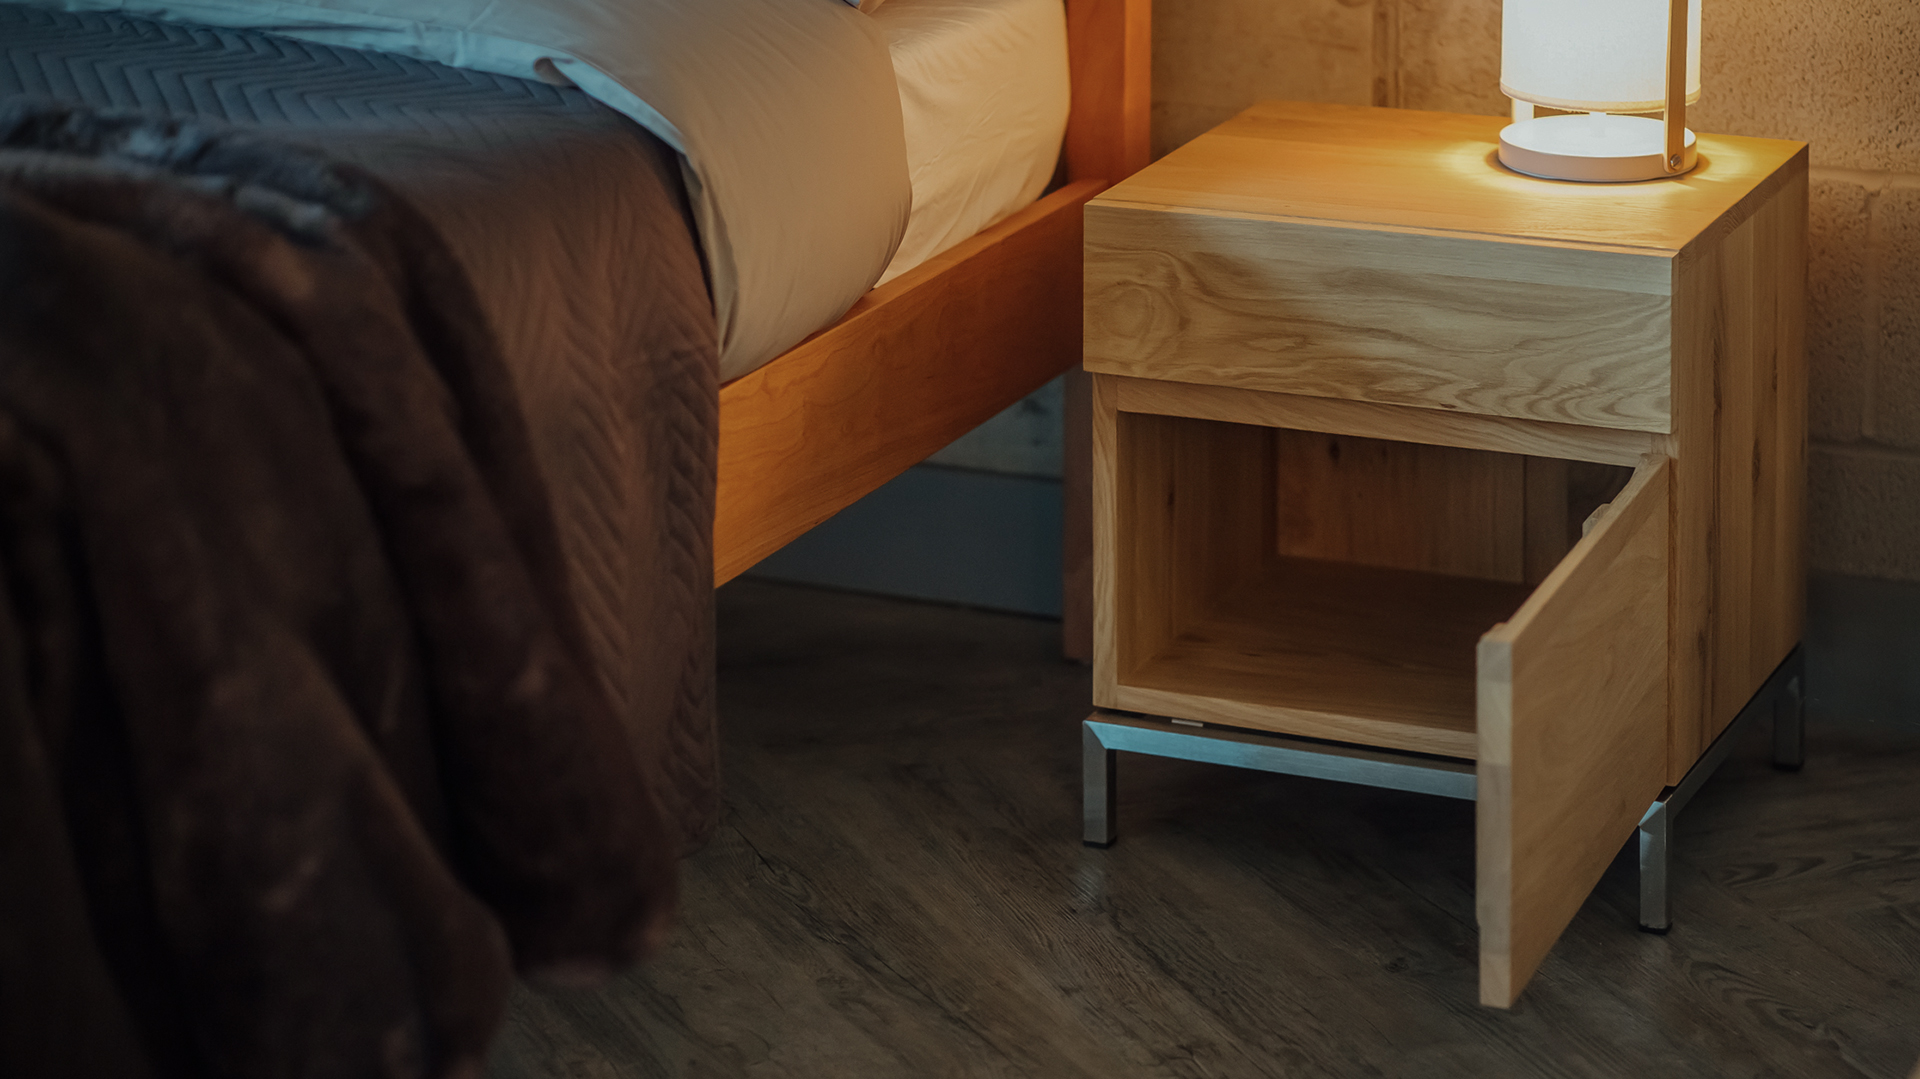 Ethnicraft ligna oak bedside cupboard